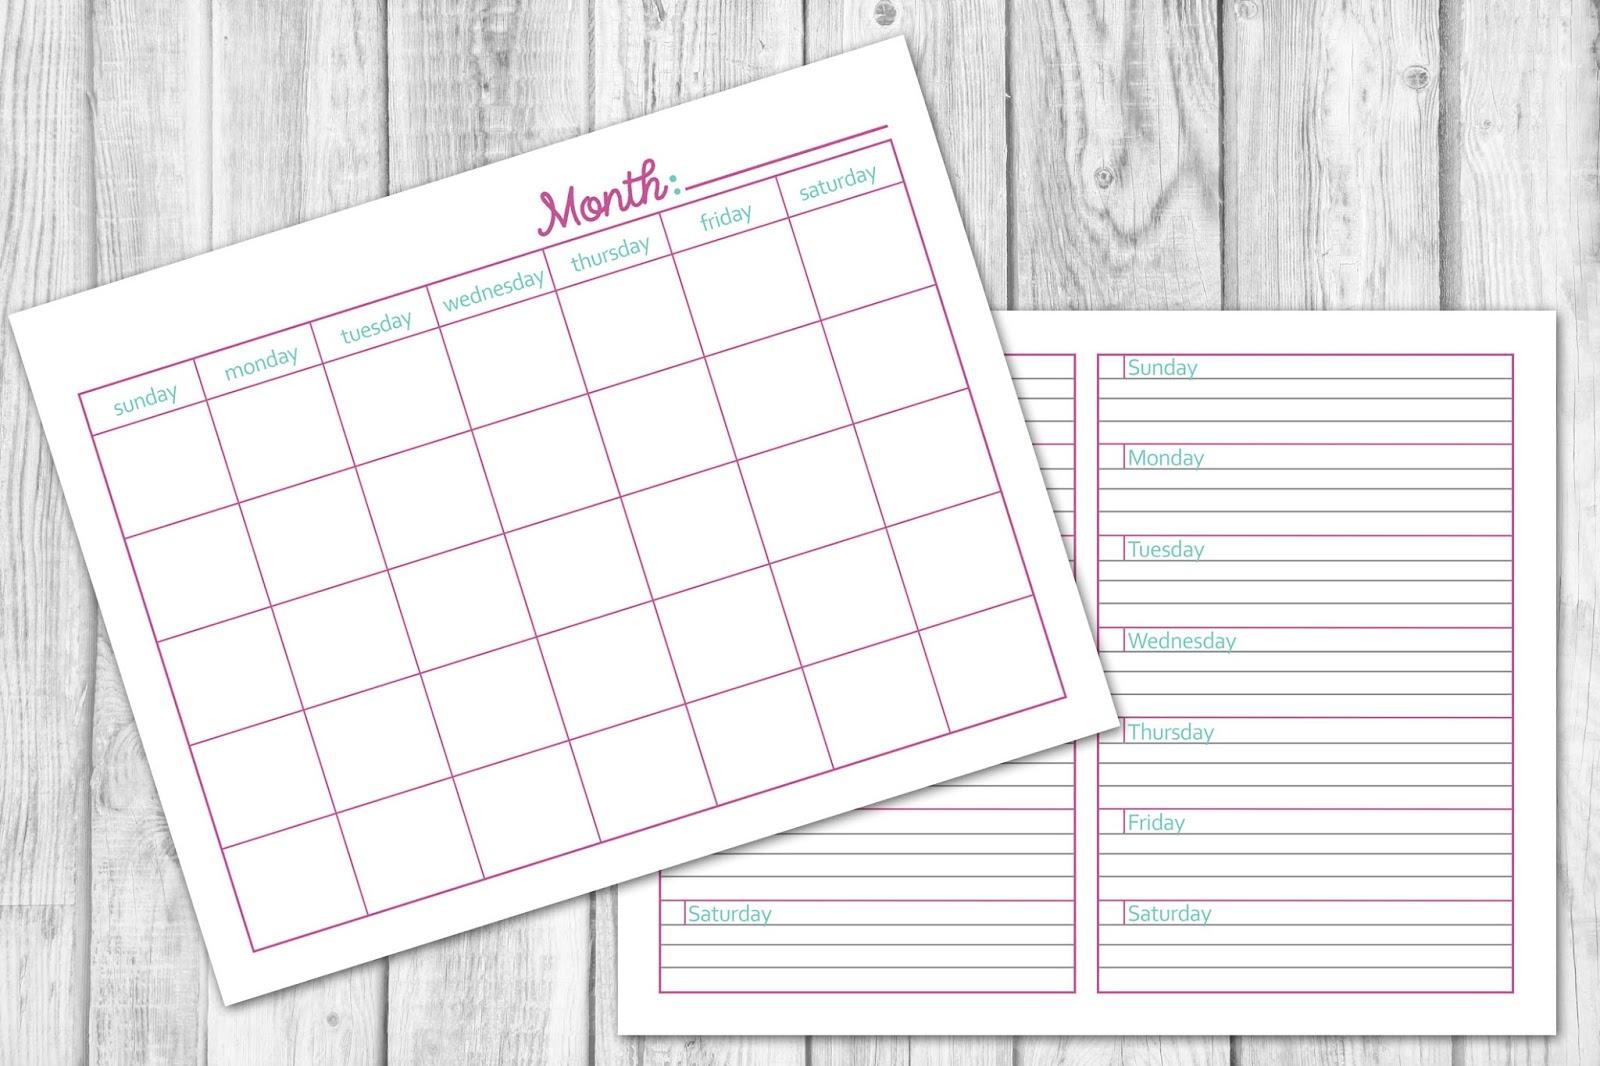 Blog planner calendar printable, Lovelytocu.ca